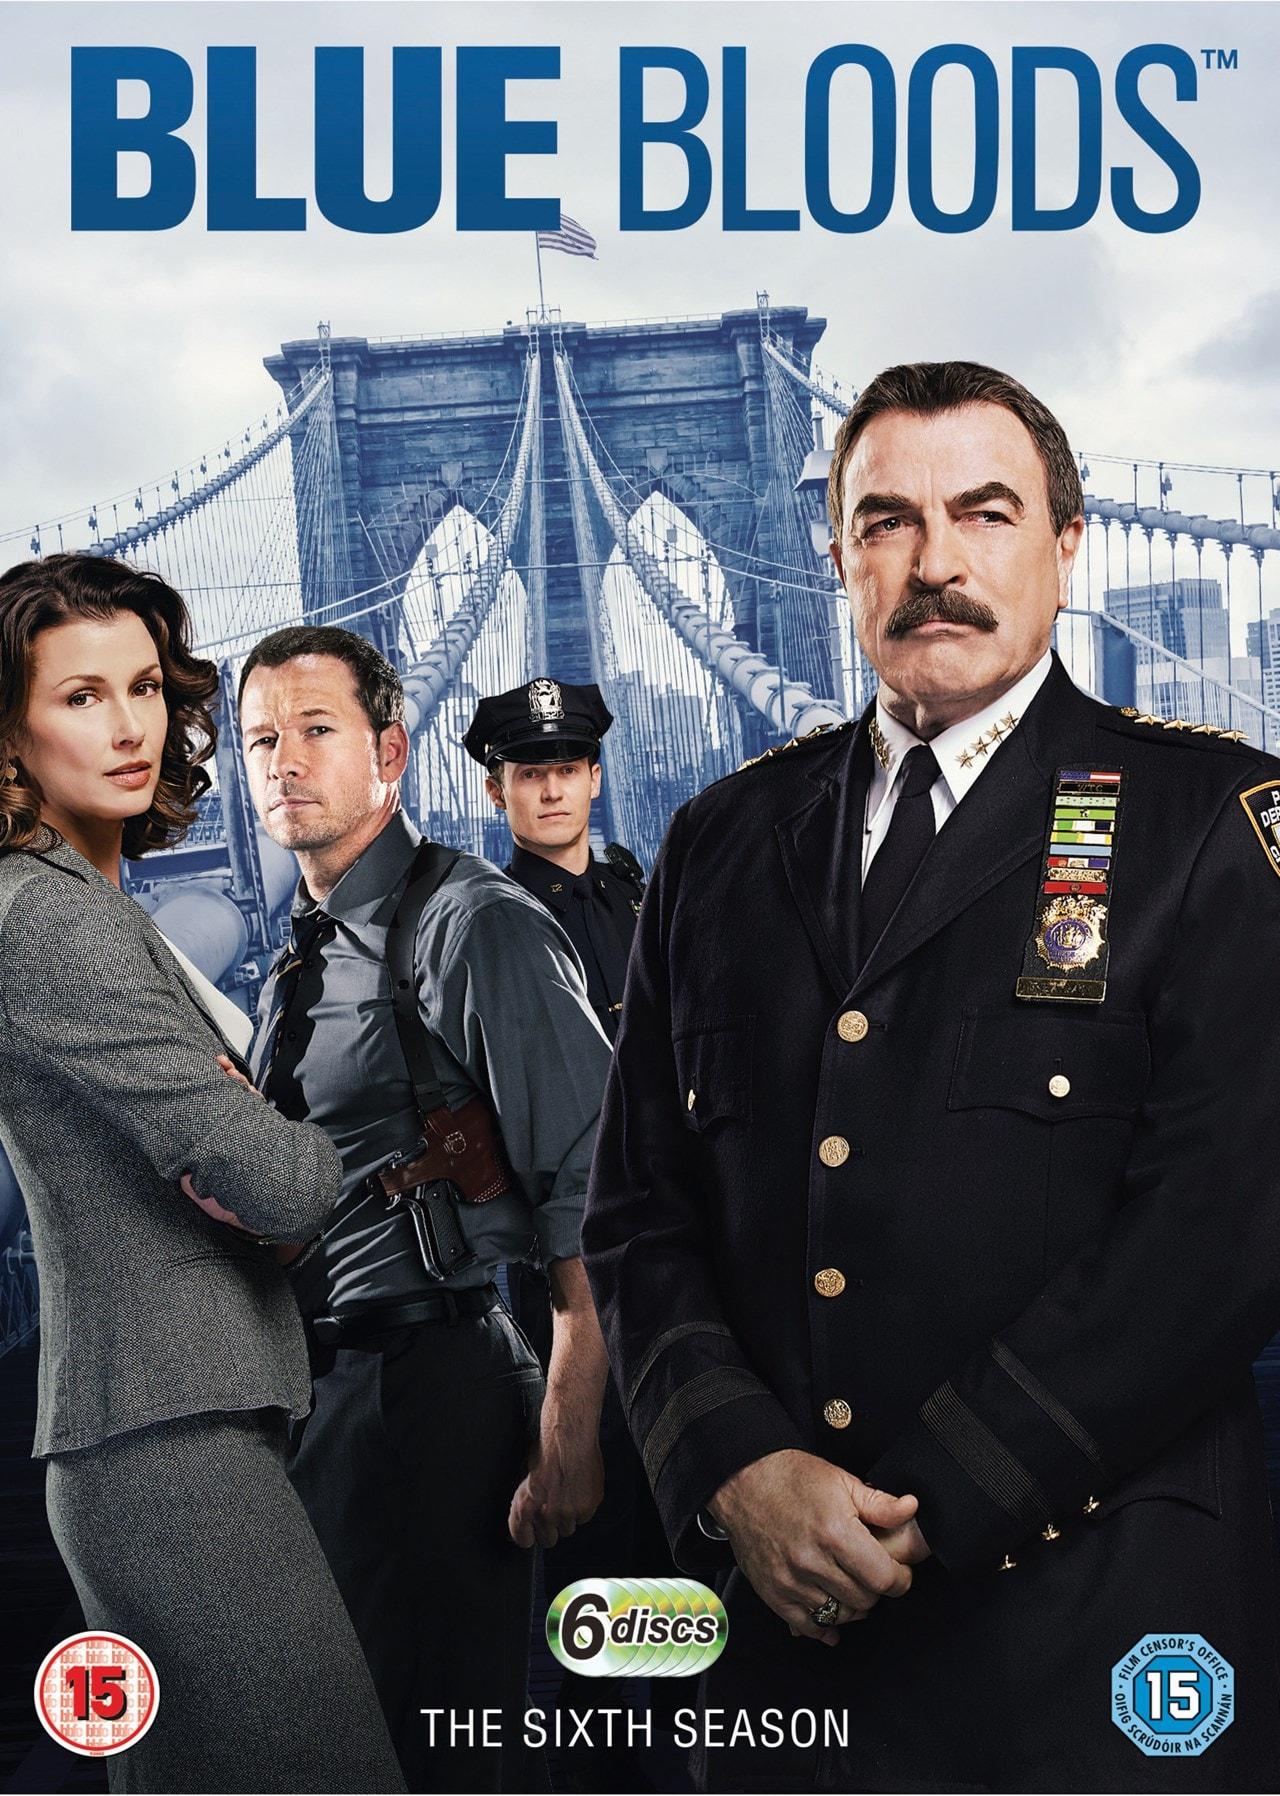 Blue Bloods: The Sixth Season - 1